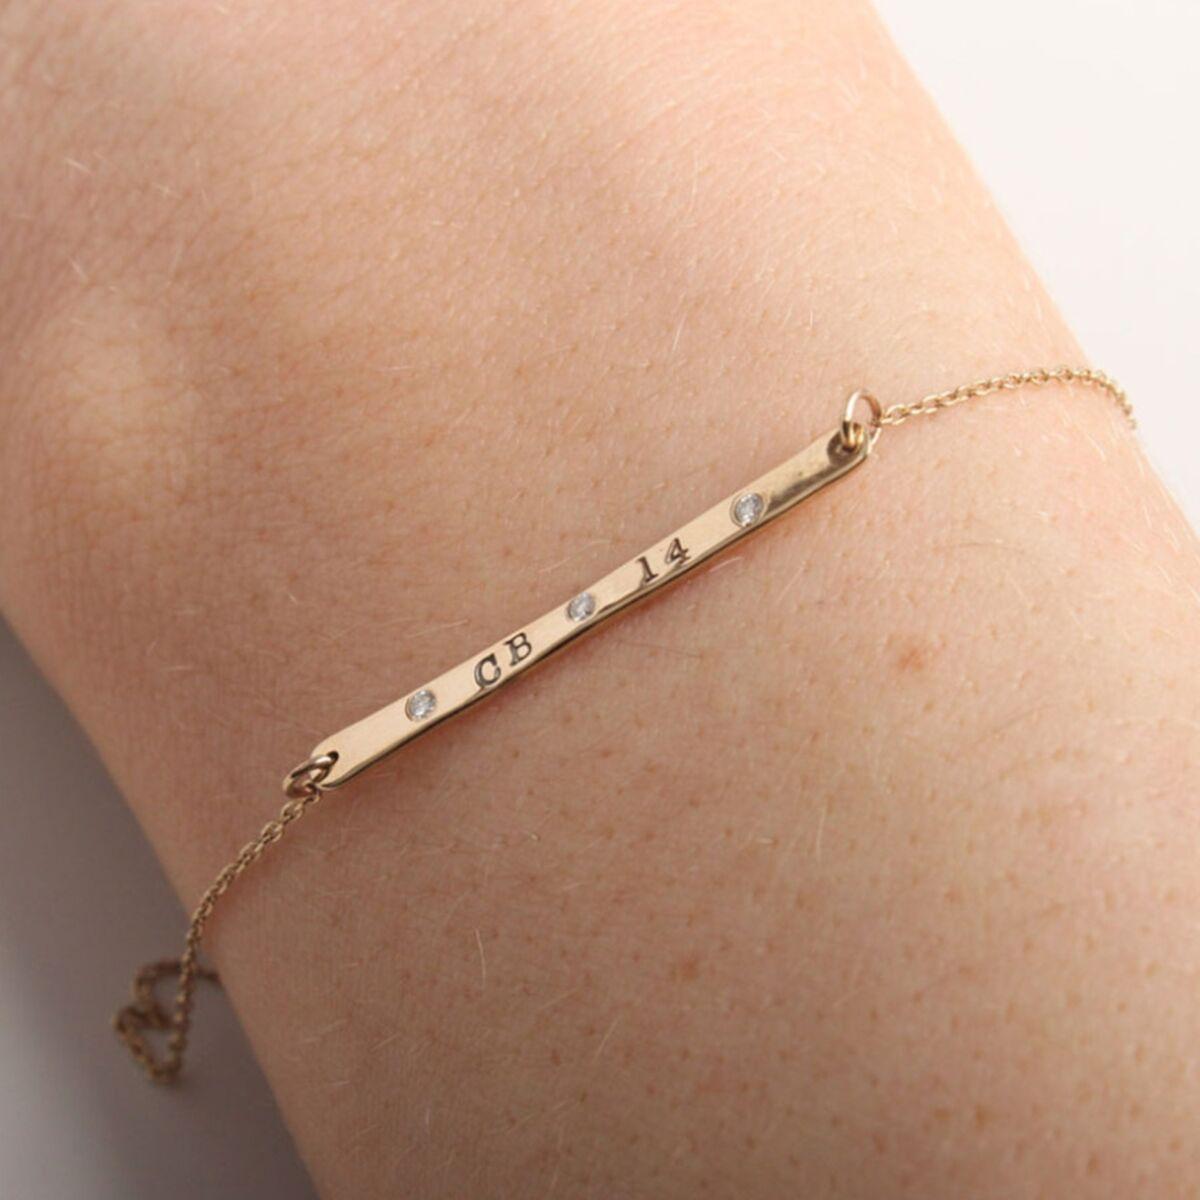 L'il ID Bracelet, gold image